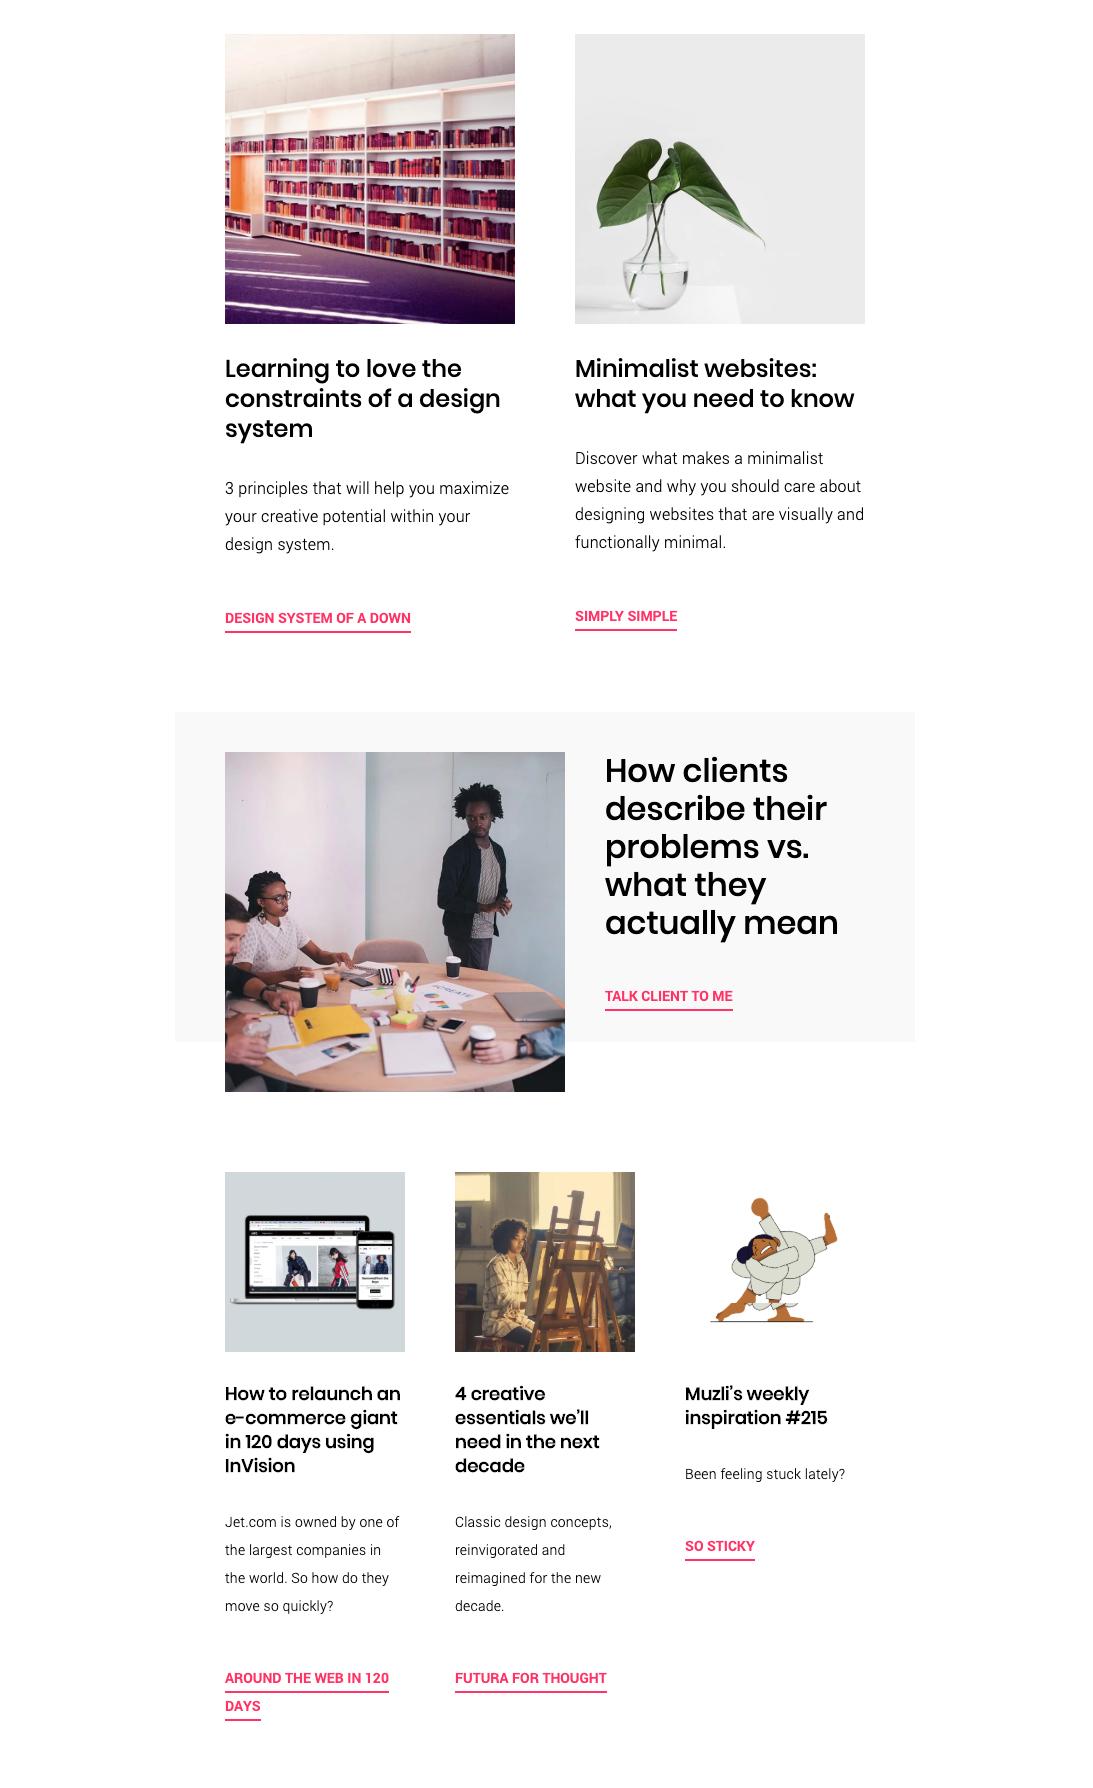 Invision_newsletter_descriptive_links_inset.png